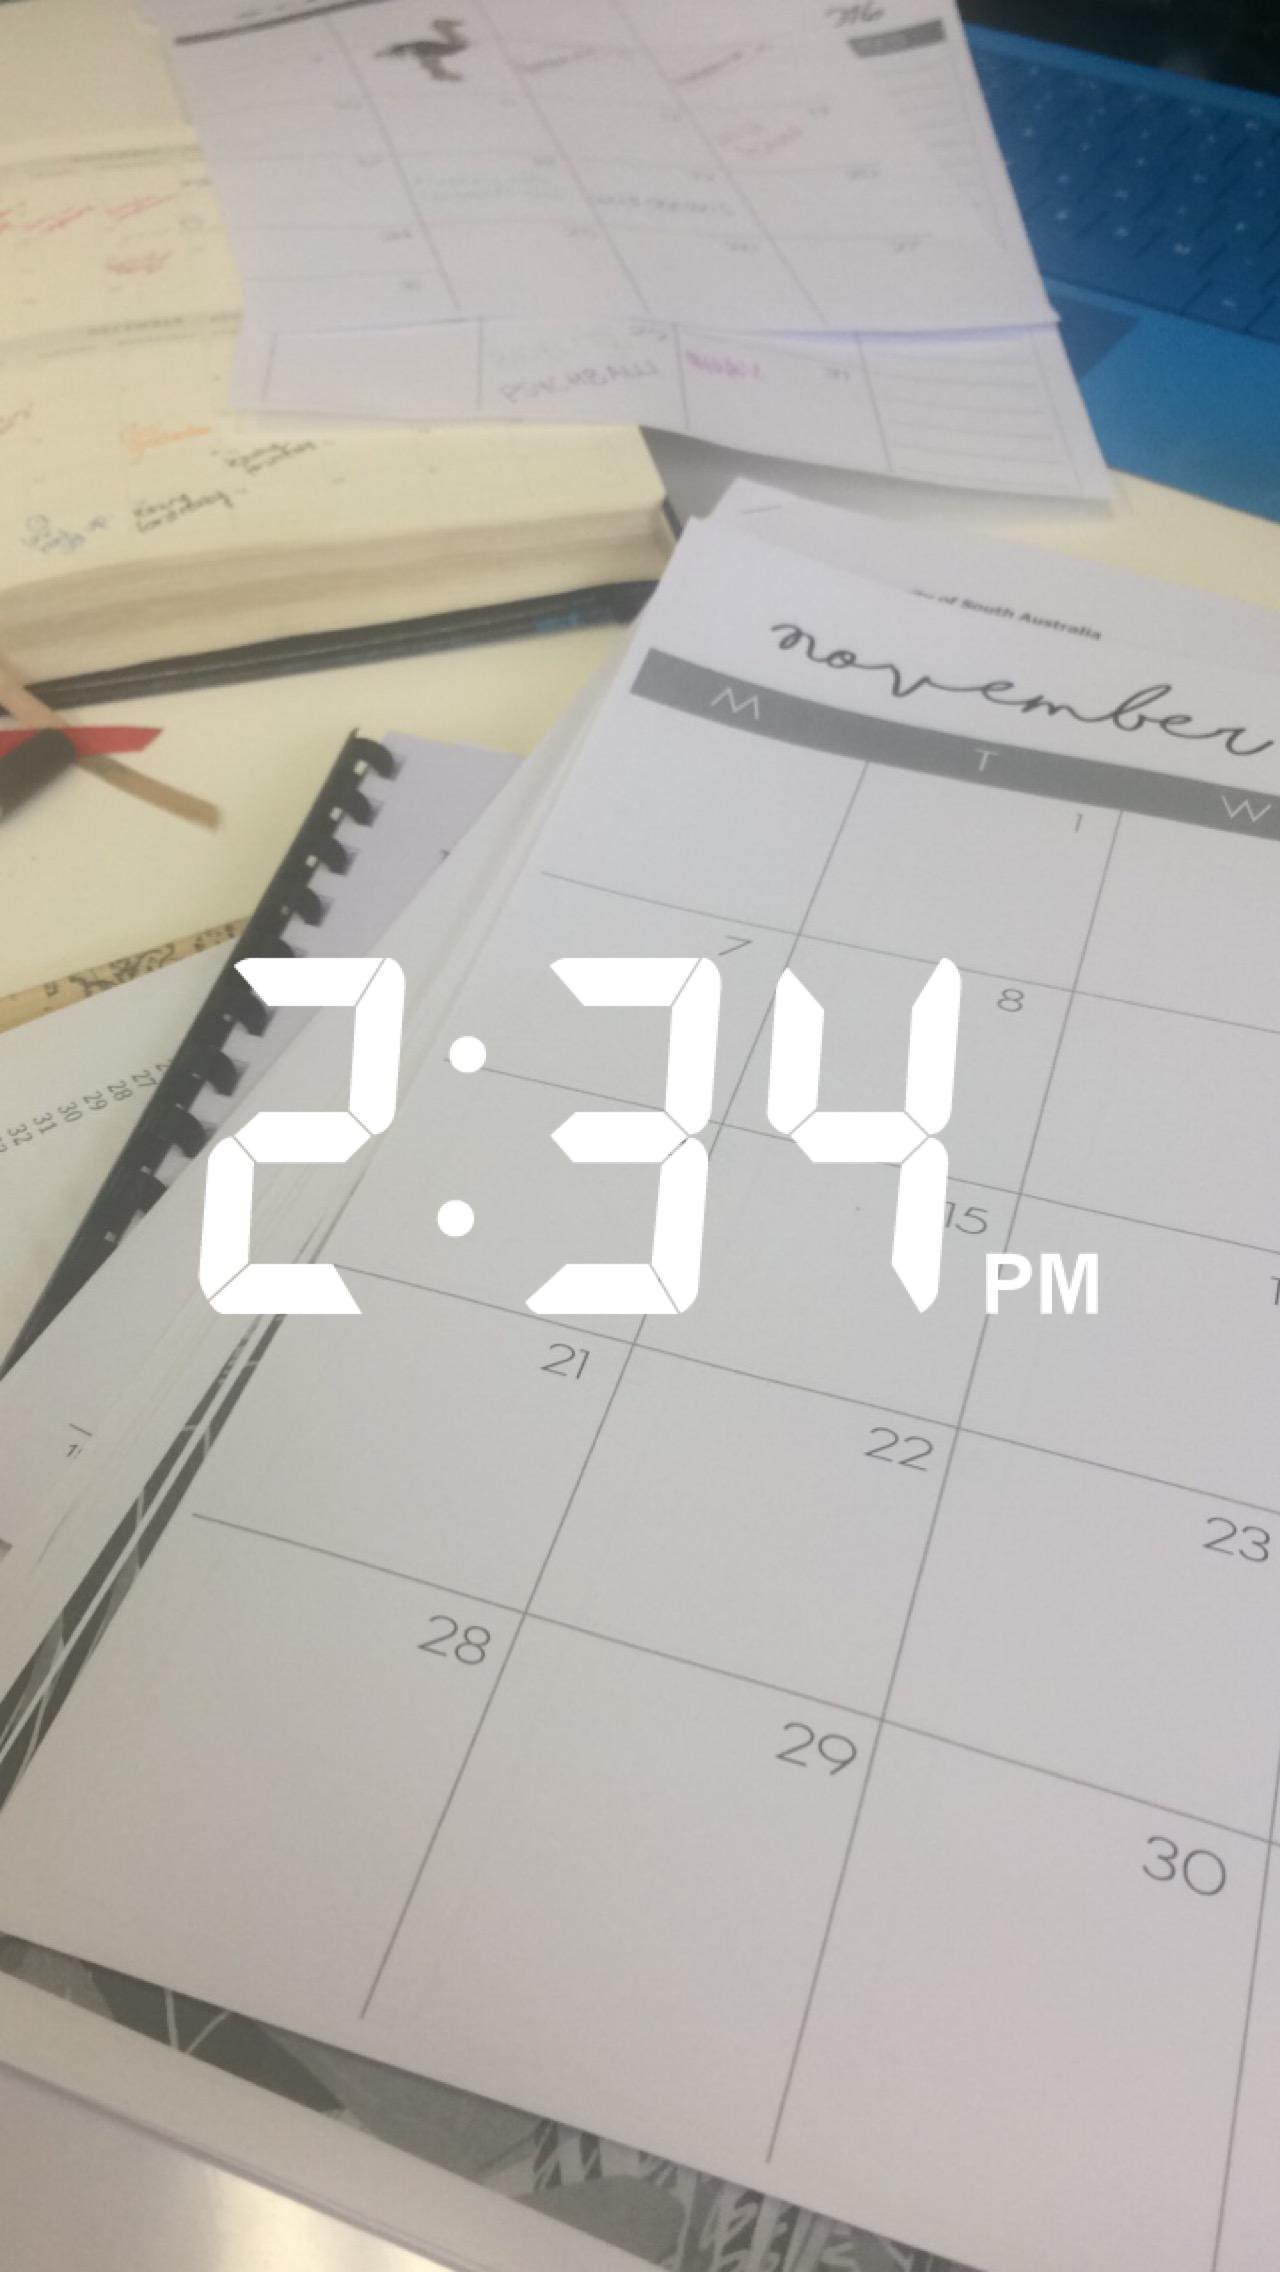 2-34pm